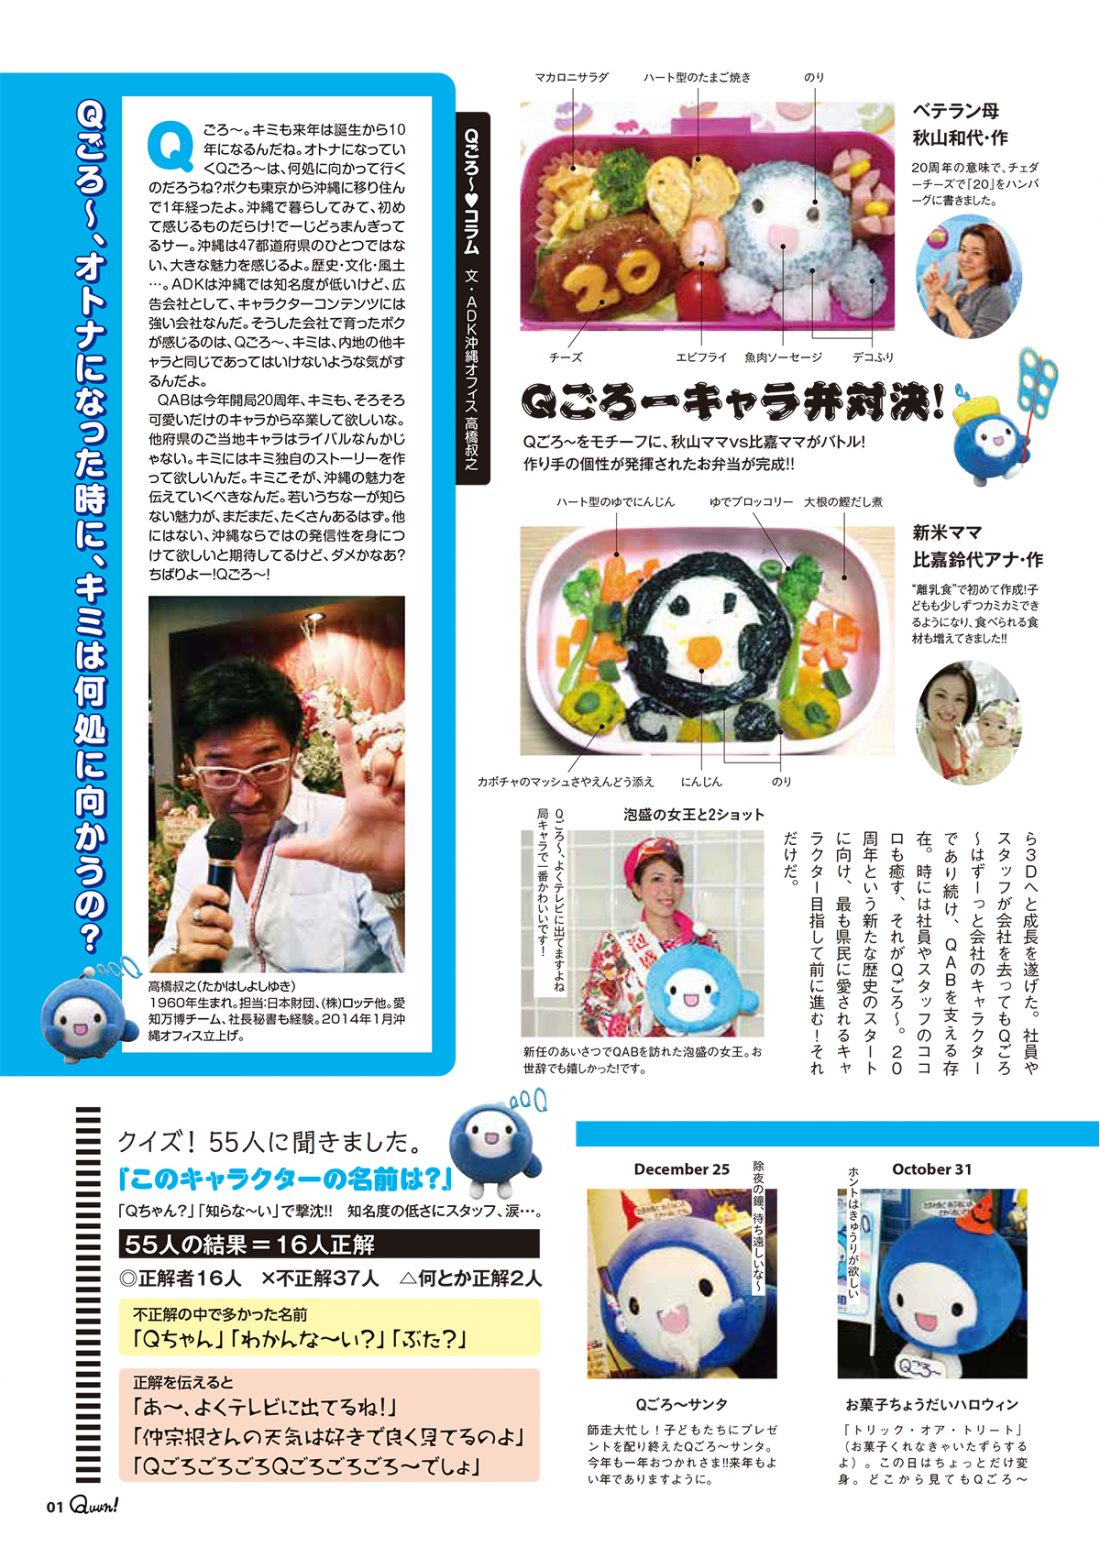 https://www.qab.co.jp/qgoro/wp-content/uploads/quun_0303-1100x1558.jpg